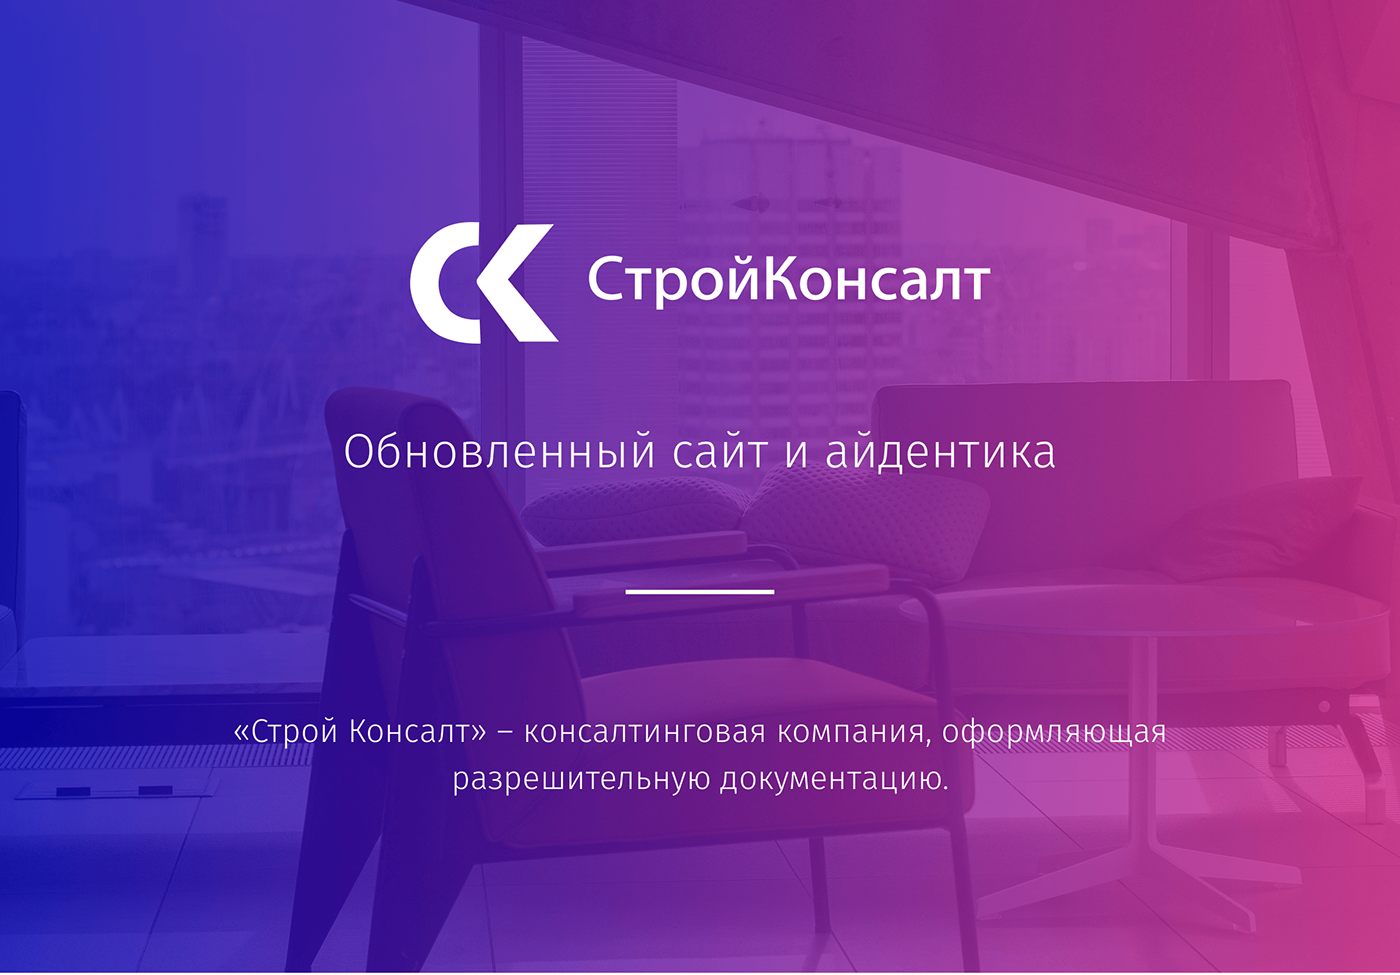 Webdesign logo identy Consulting Web site brand redesign corporate